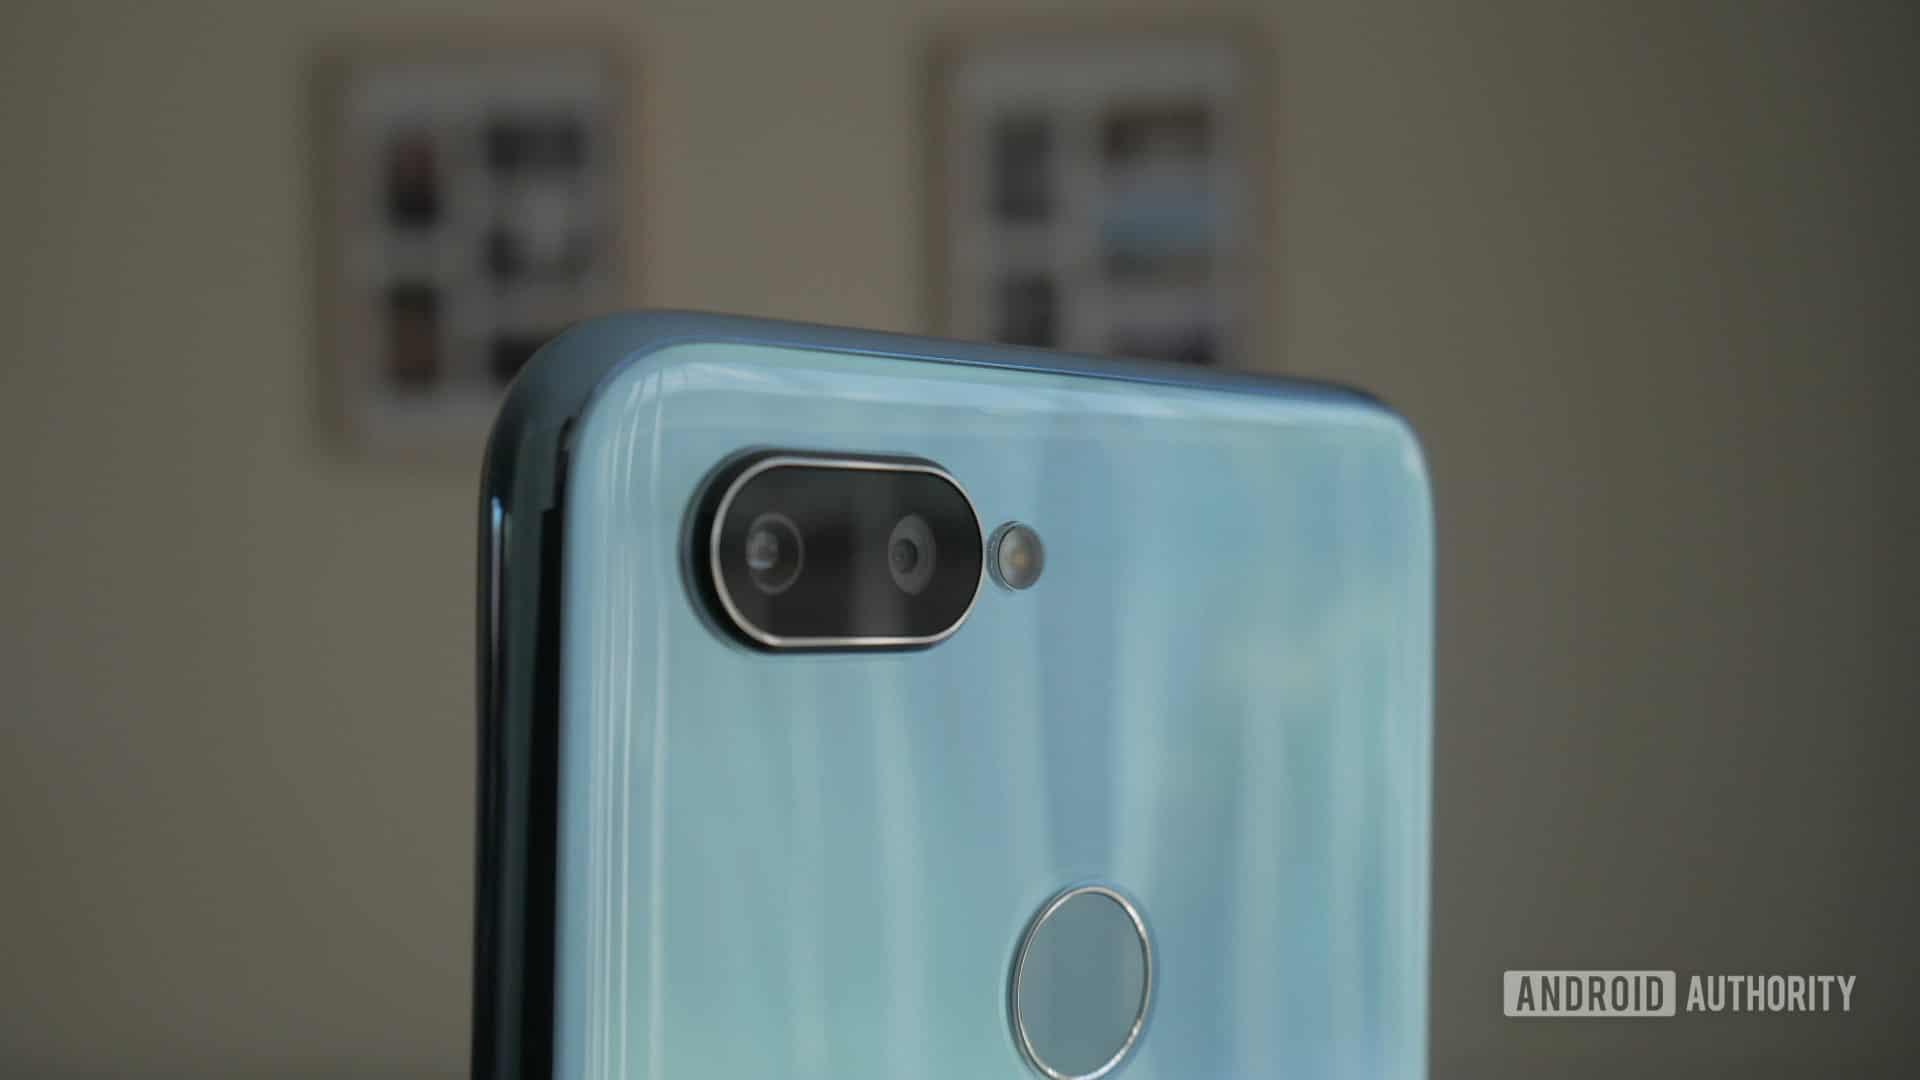 Realme 2 Pro : افضل هاتف في الفئة المتوسطة؟ 5